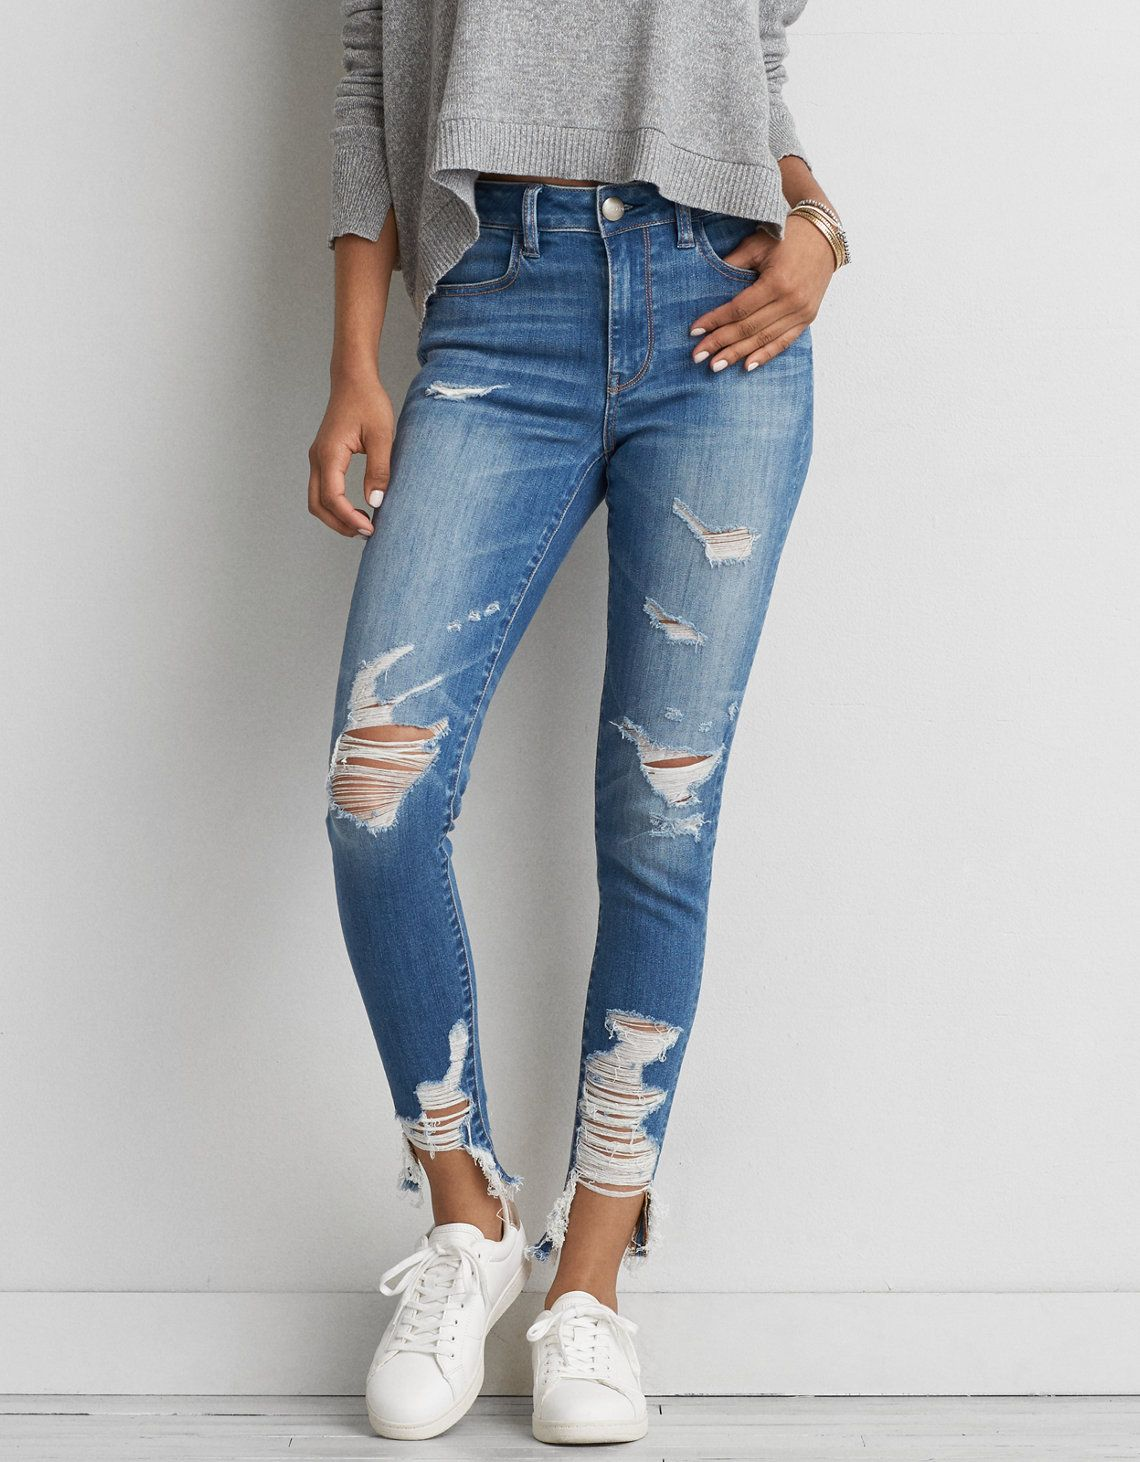 Pin De Linda En Fashion Jeans De Moda Jeans Rasgados Mujer Pantalones De Mezclilla Mujer